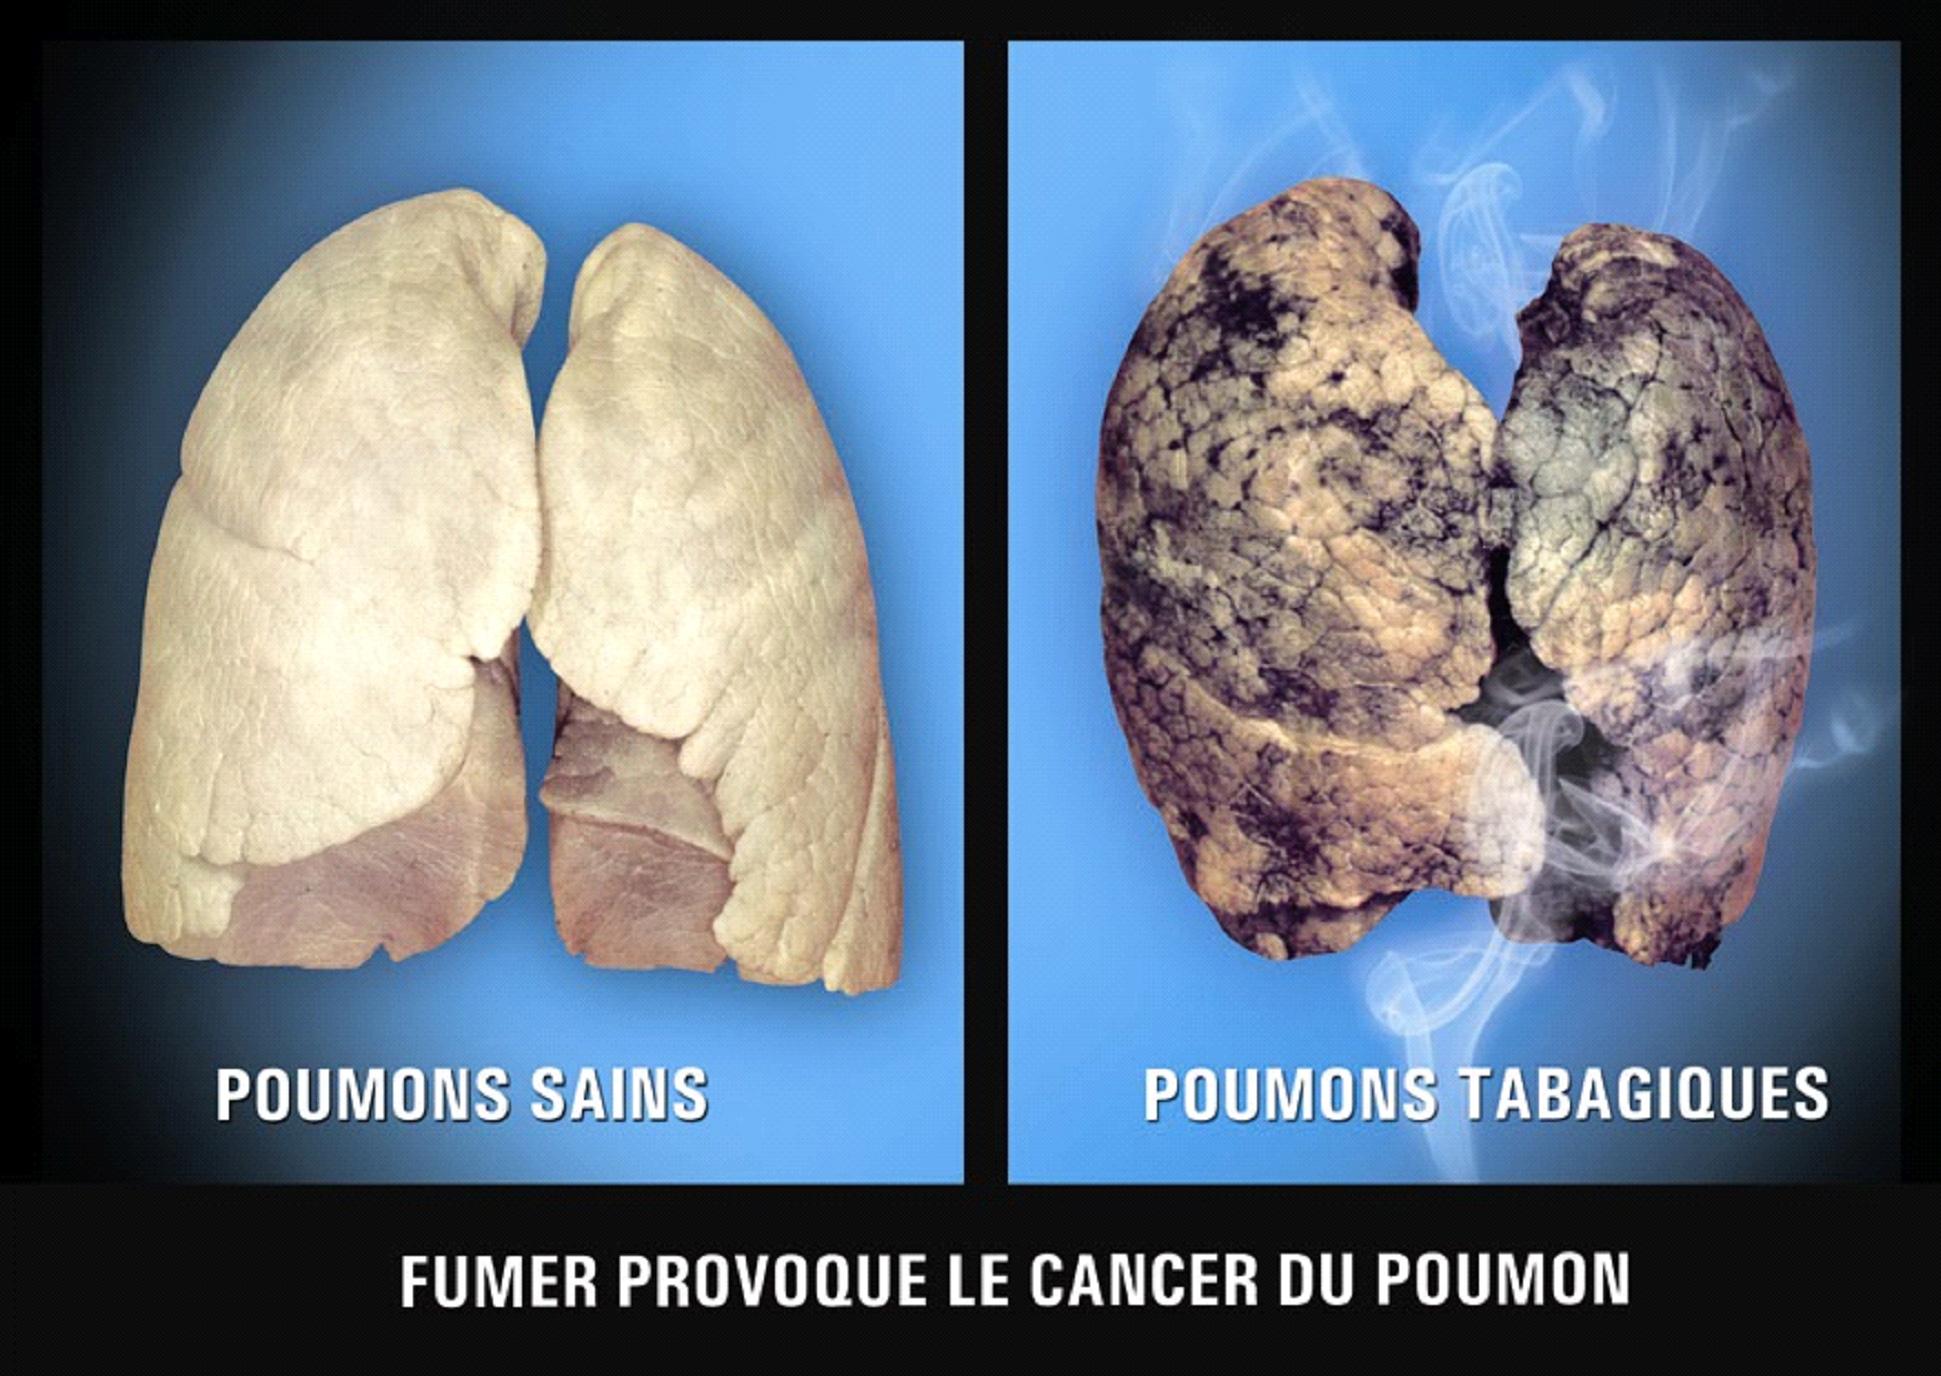 mauritius tobacco labelling regulations